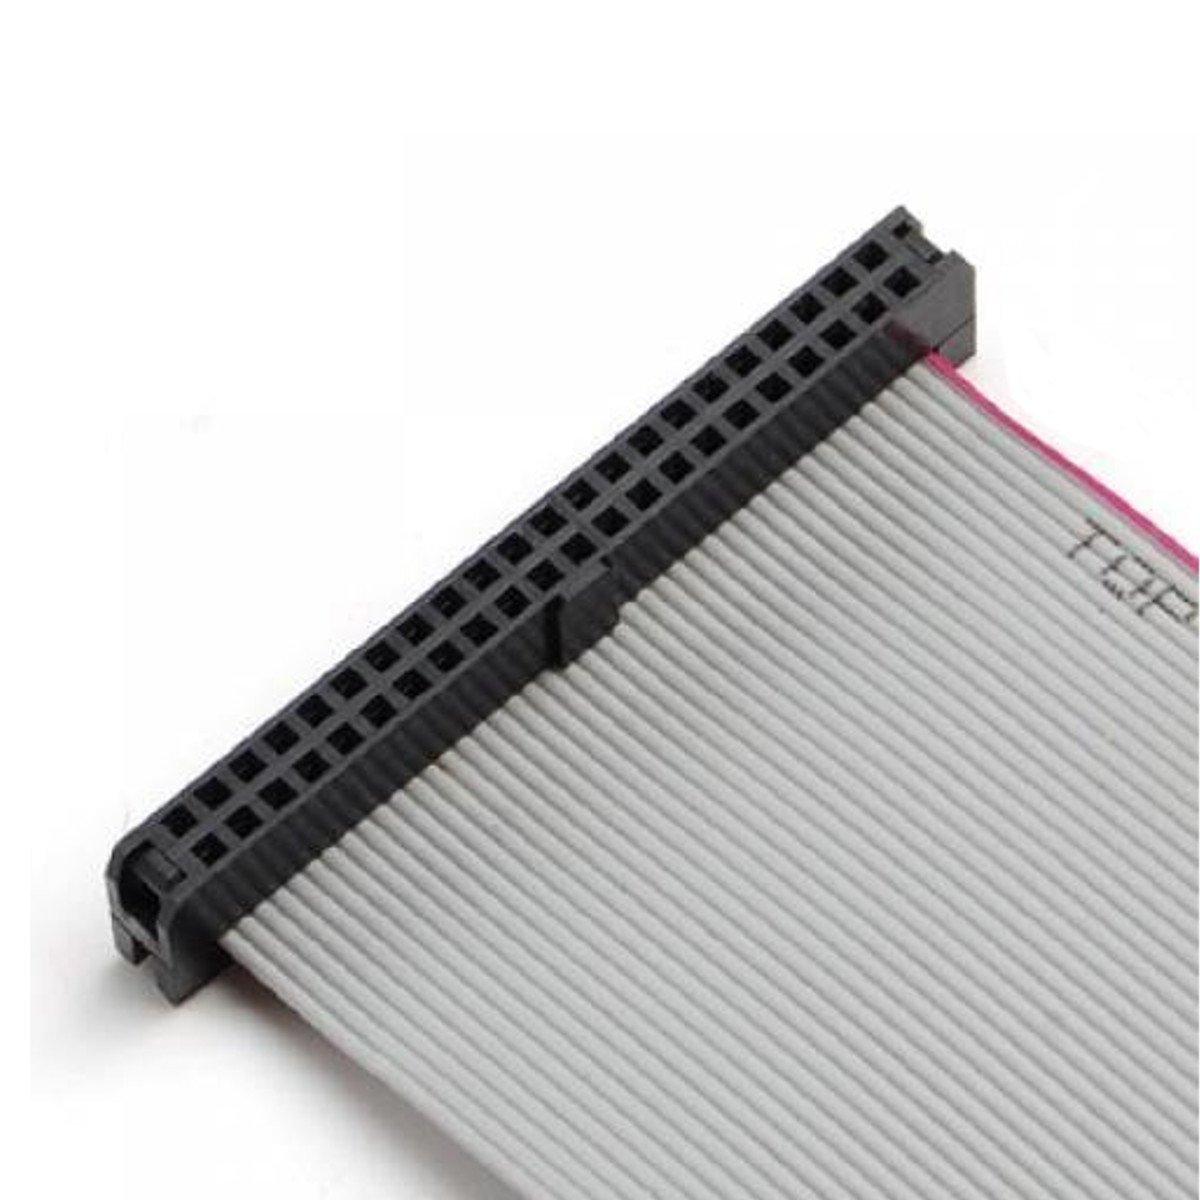 adaptare 49101 IDE-Flachbandkabel (5 cm (2,5 Zoll), 44-polig, Buchse ...